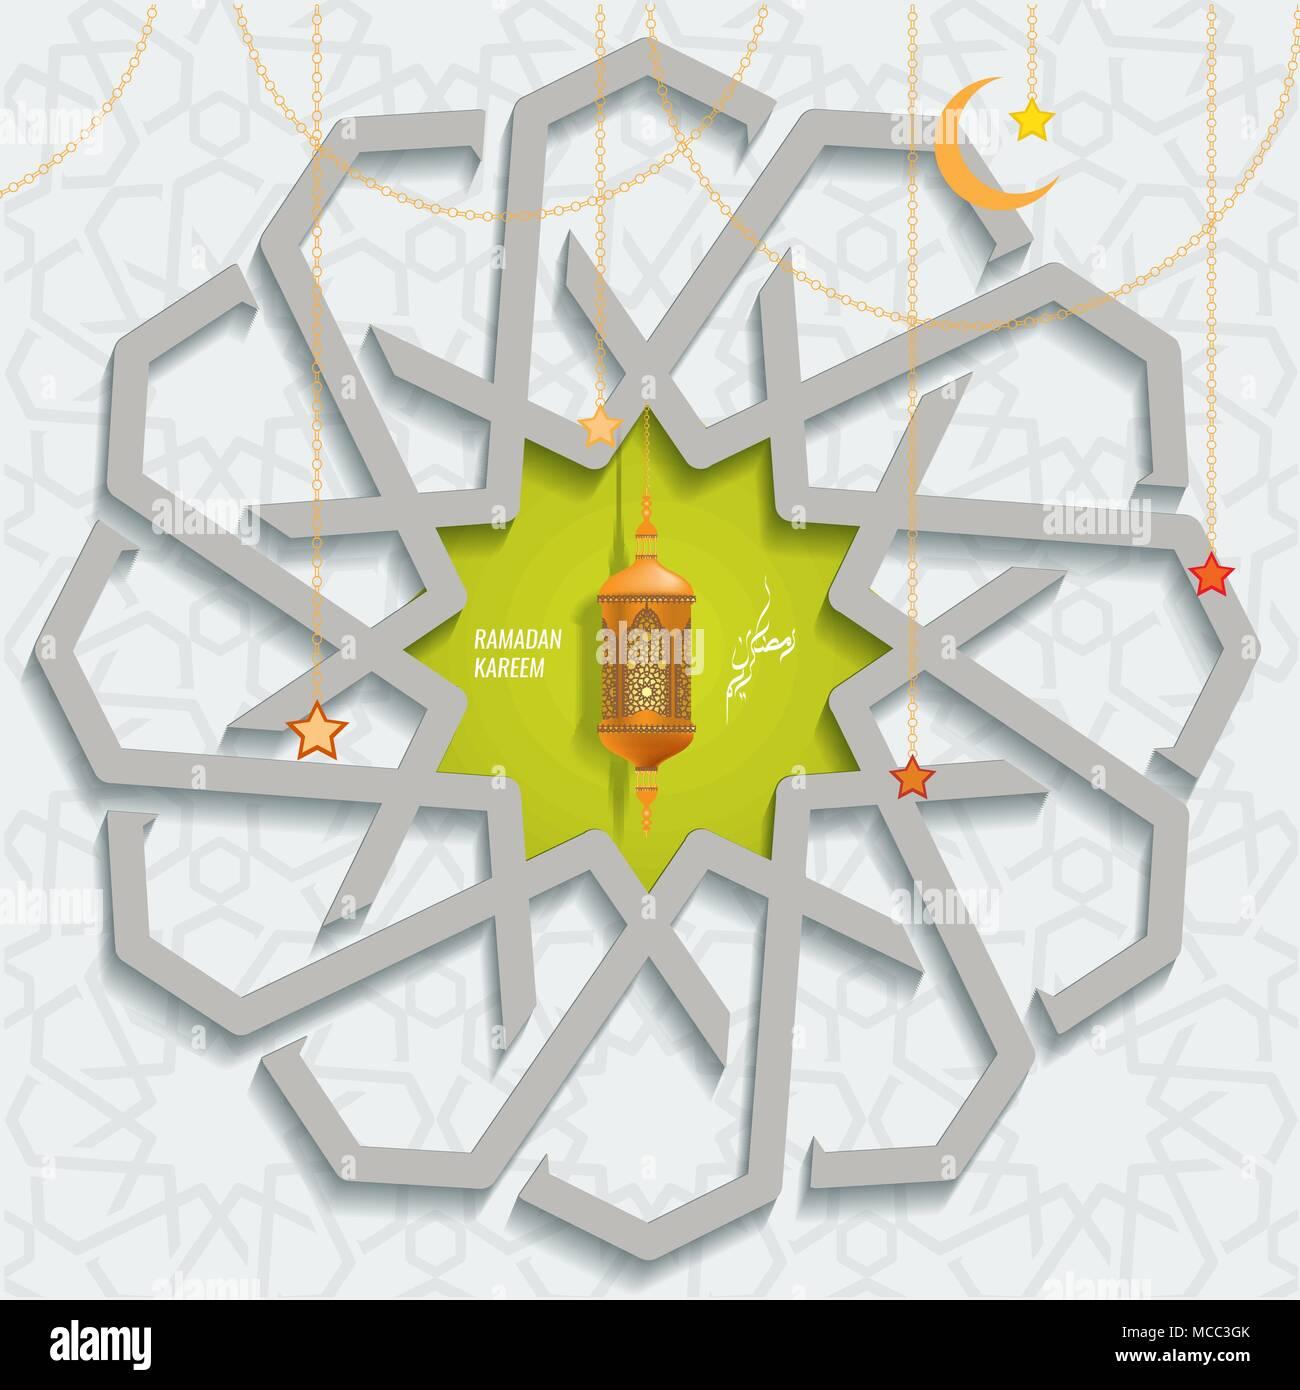 Vector ramadan karem islamic greeting card with arabic moroccan vector ramadan karem islamic greeting card with arabic moroccan pattern geometric ornament background m4hsunfo